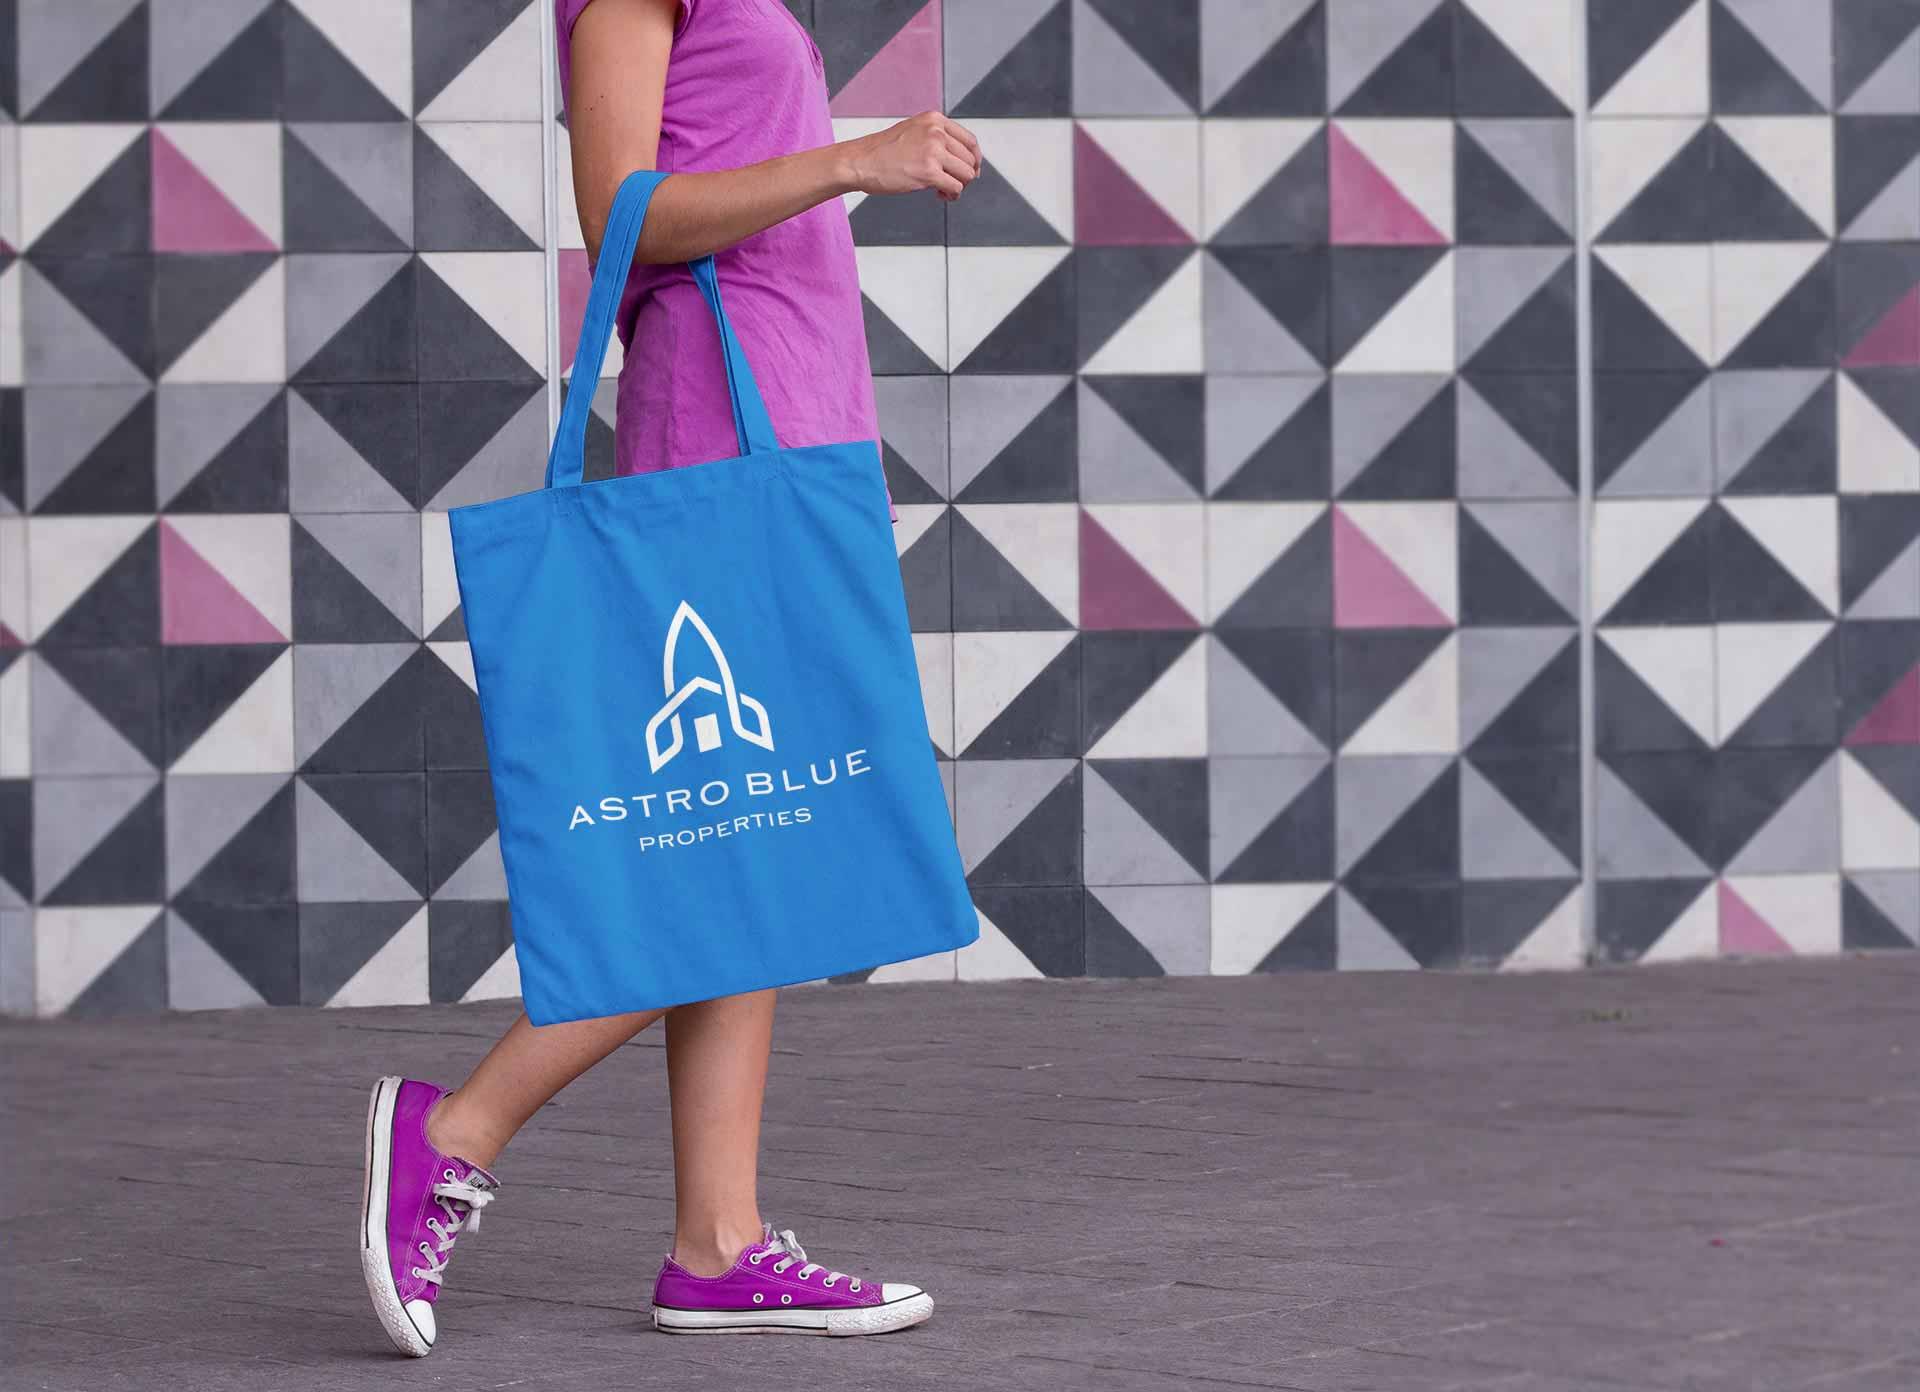 Astro Blue Estate Agent logo on Tote Bag